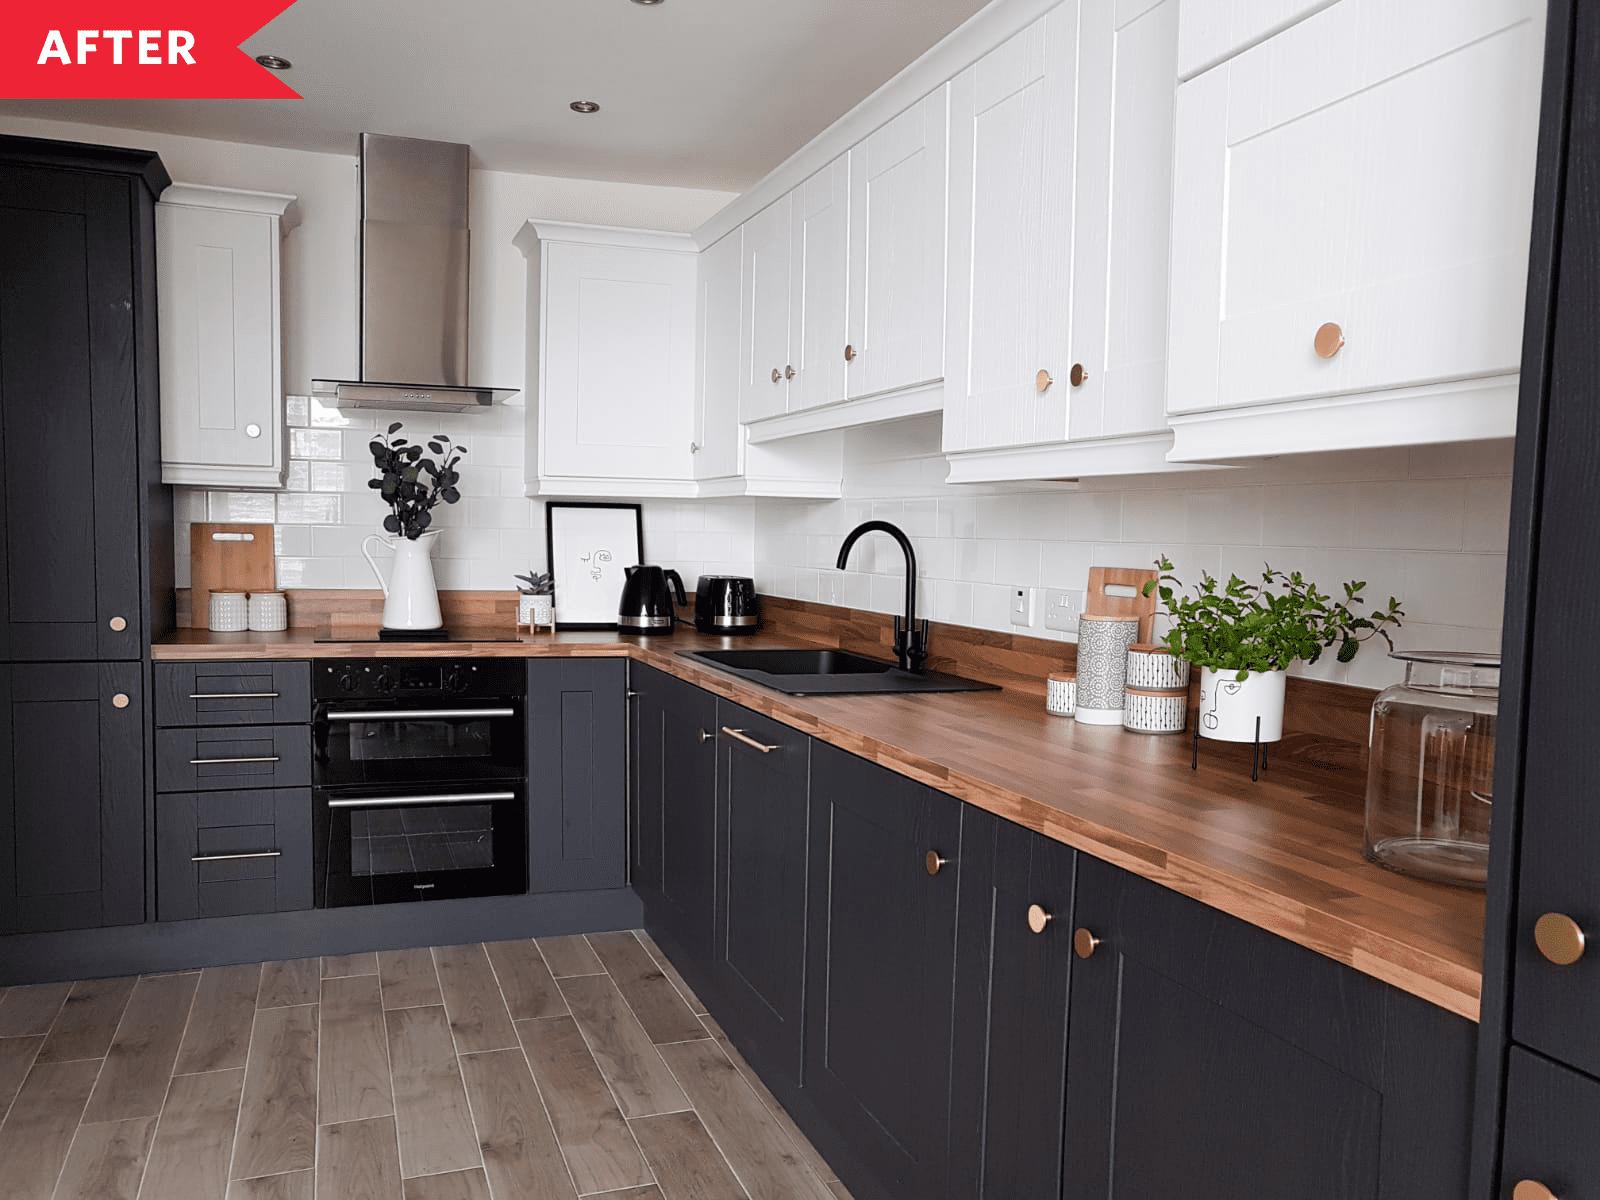 15 Stylish Black White Kitchens How To Use Black White In Kitchen Decor Apartment Therapy